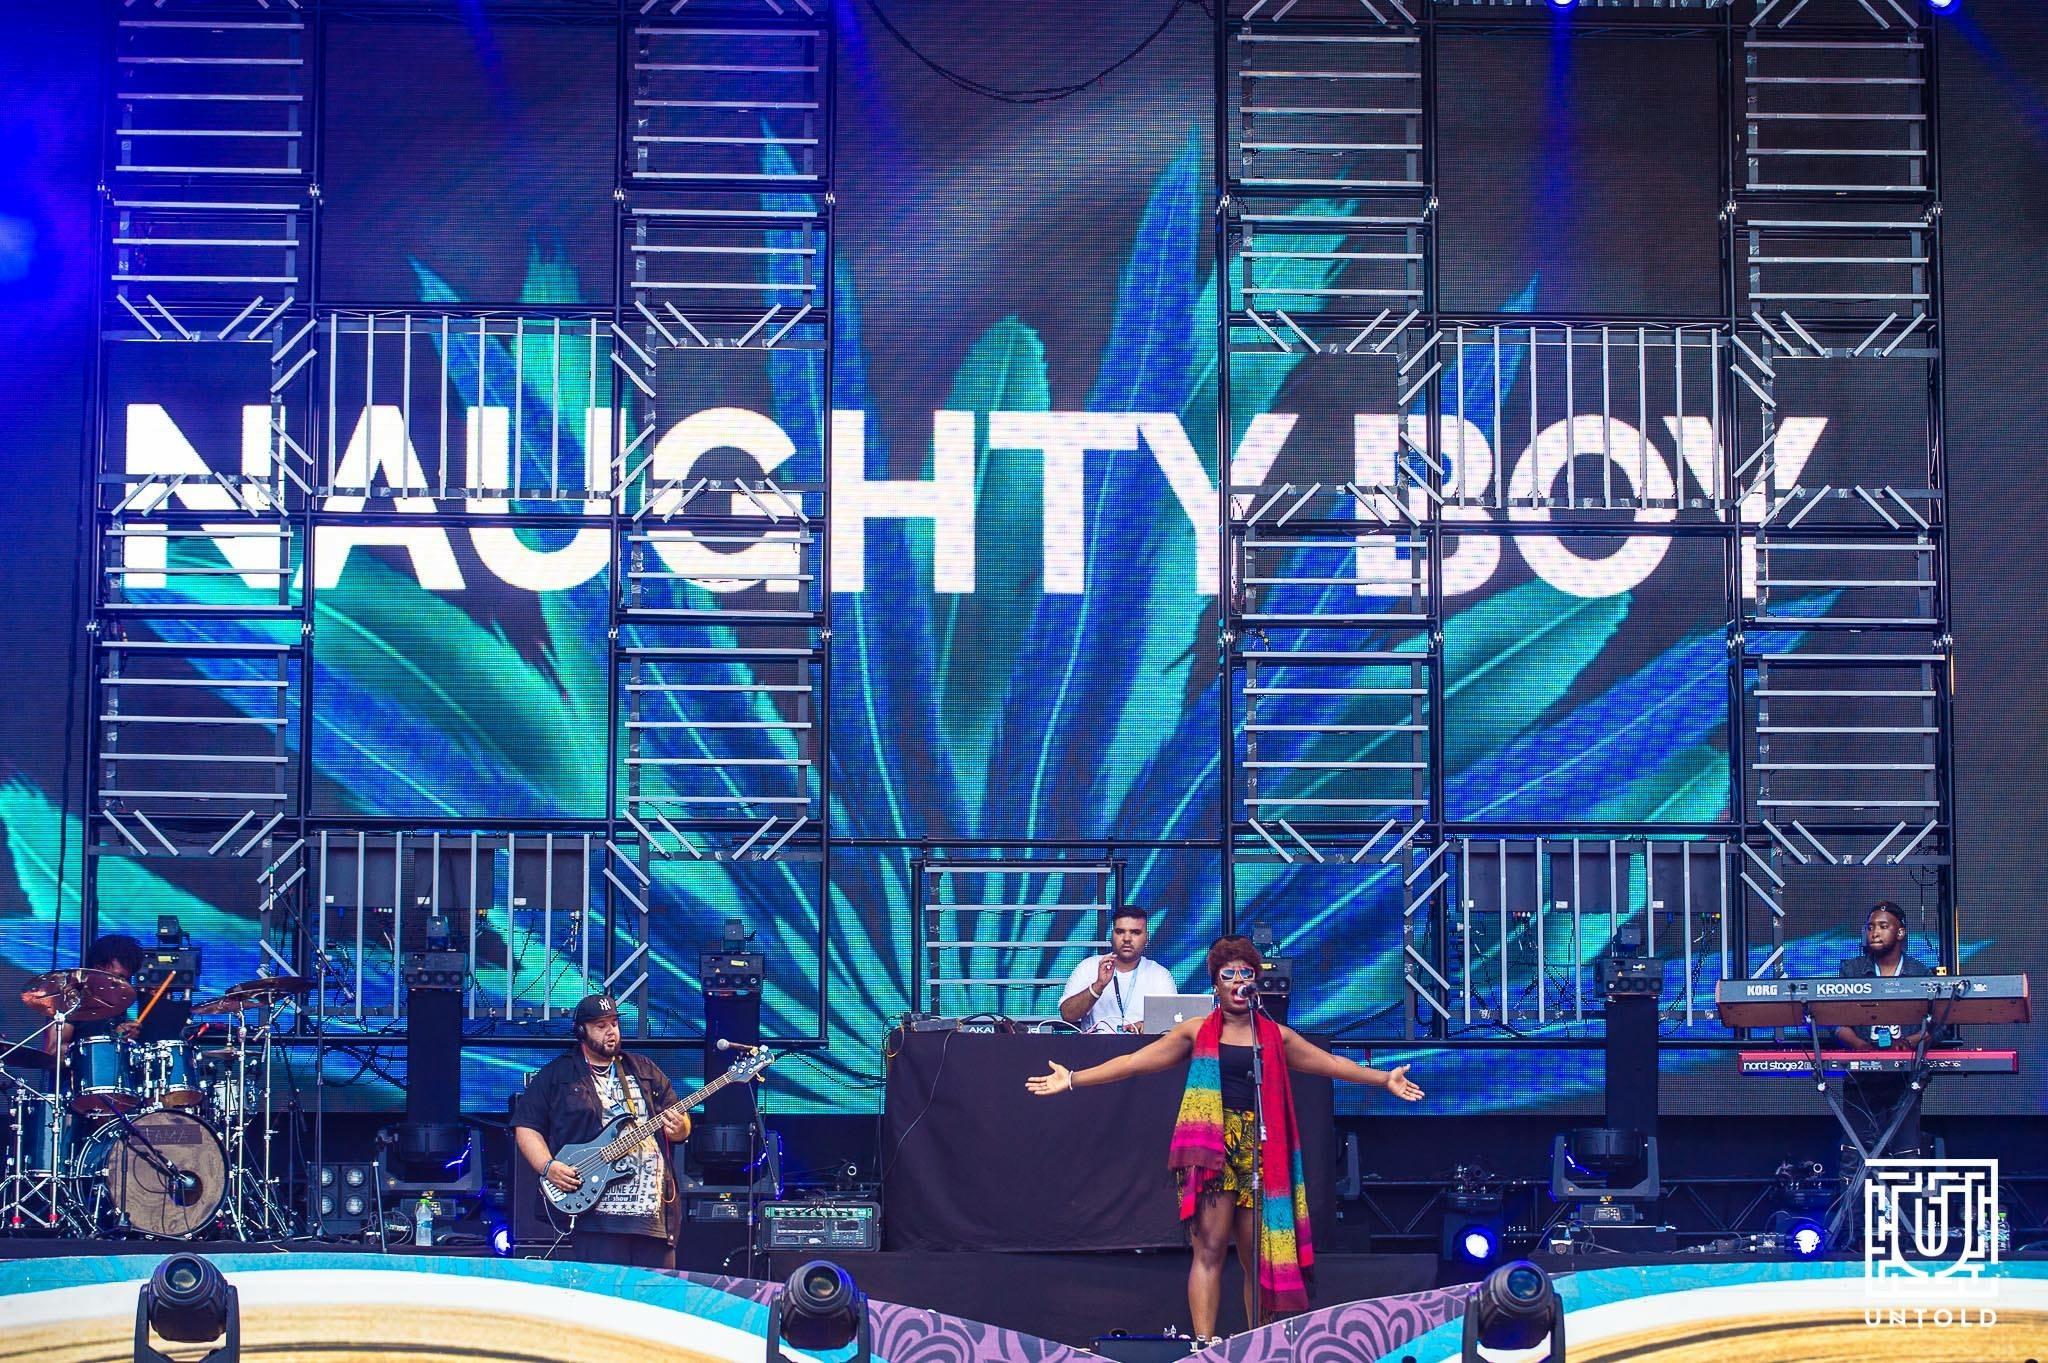 Naughty Boy Show, Romania 2016